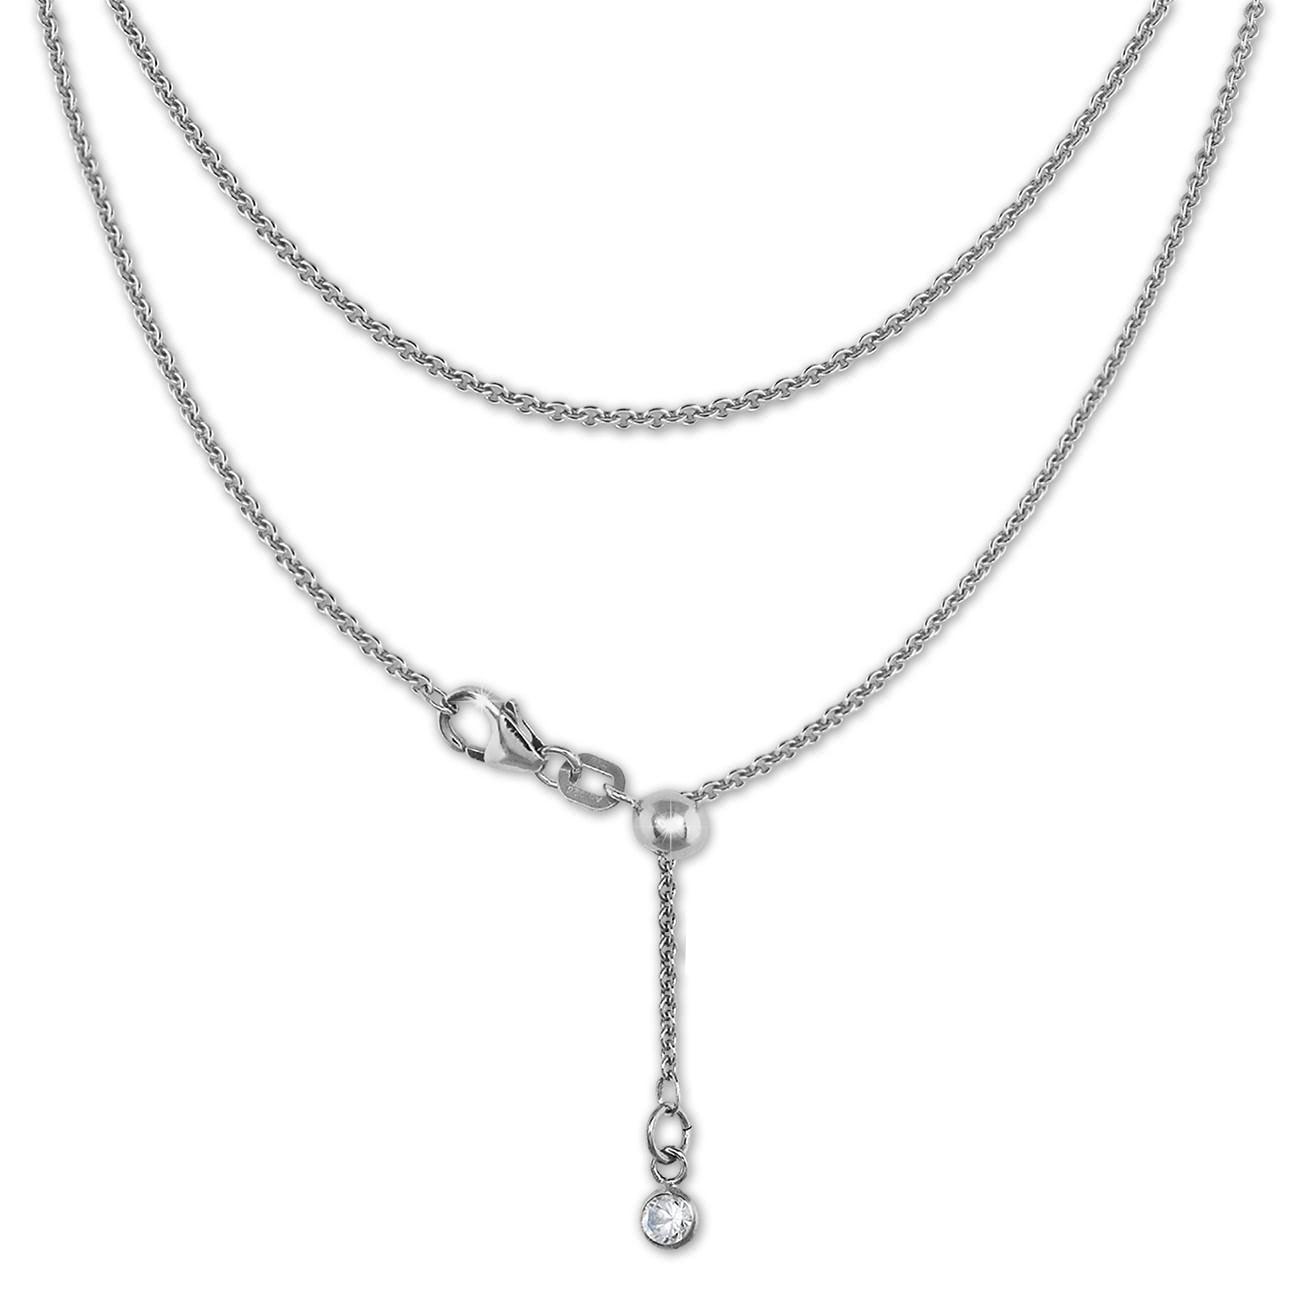 SilberDream Collier Kette Zirkonia 925er Sterling Silber Damen 45cm SDK22545J